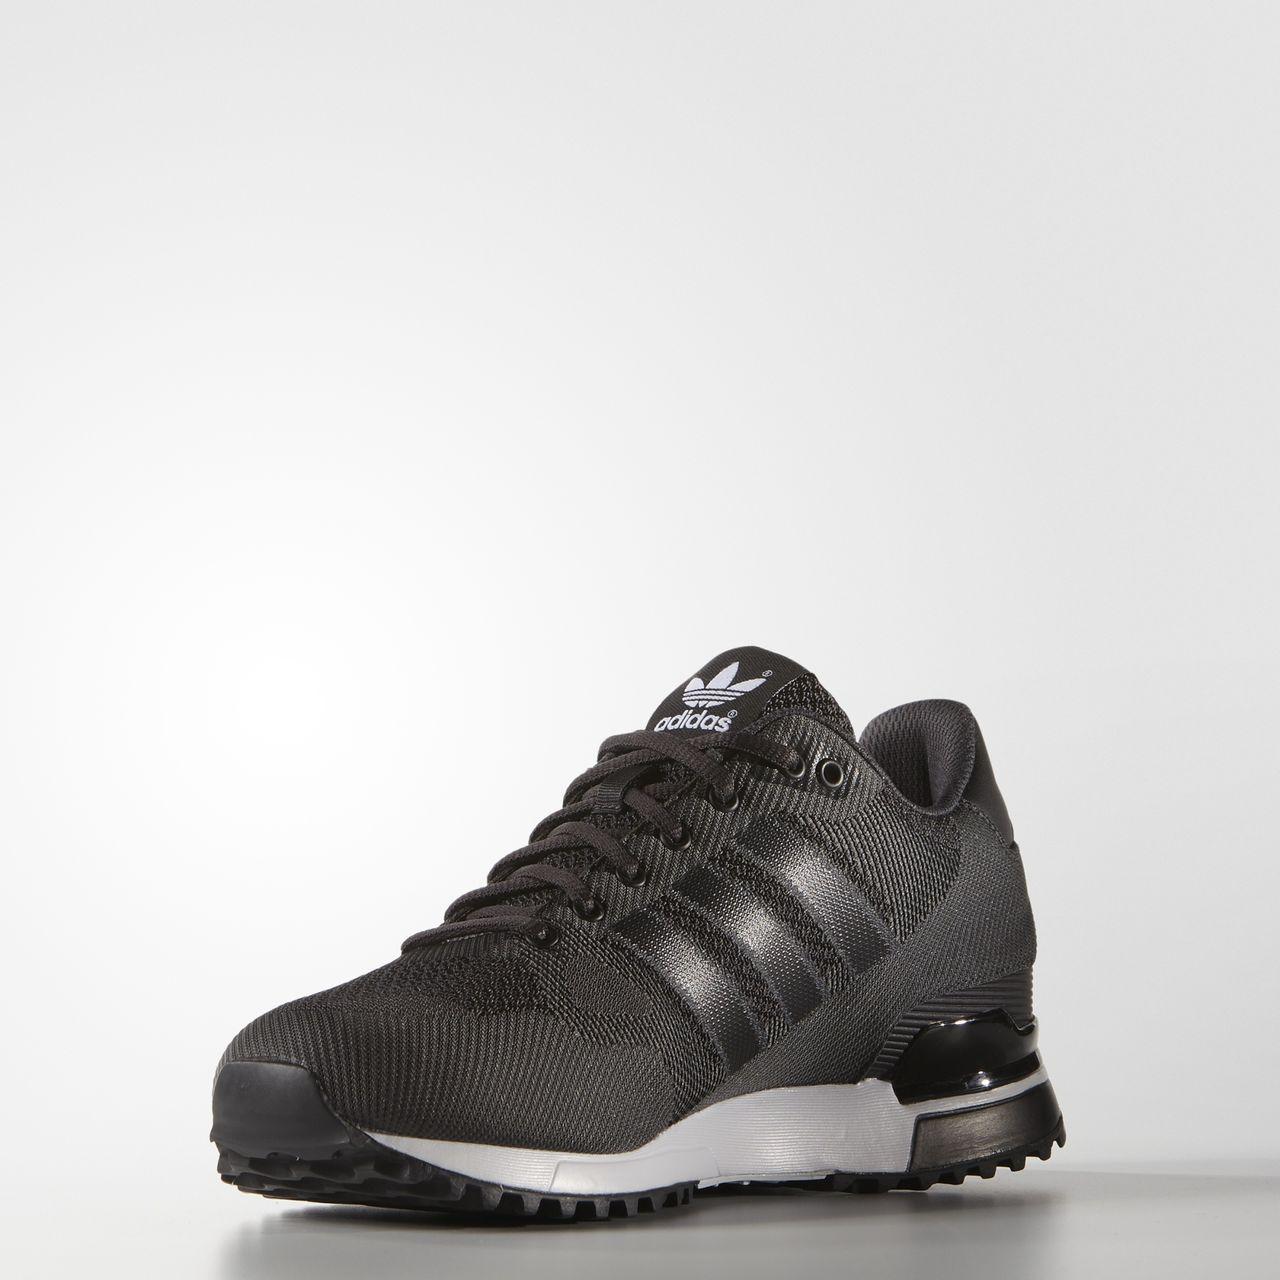 adidas zx 750 shadow black